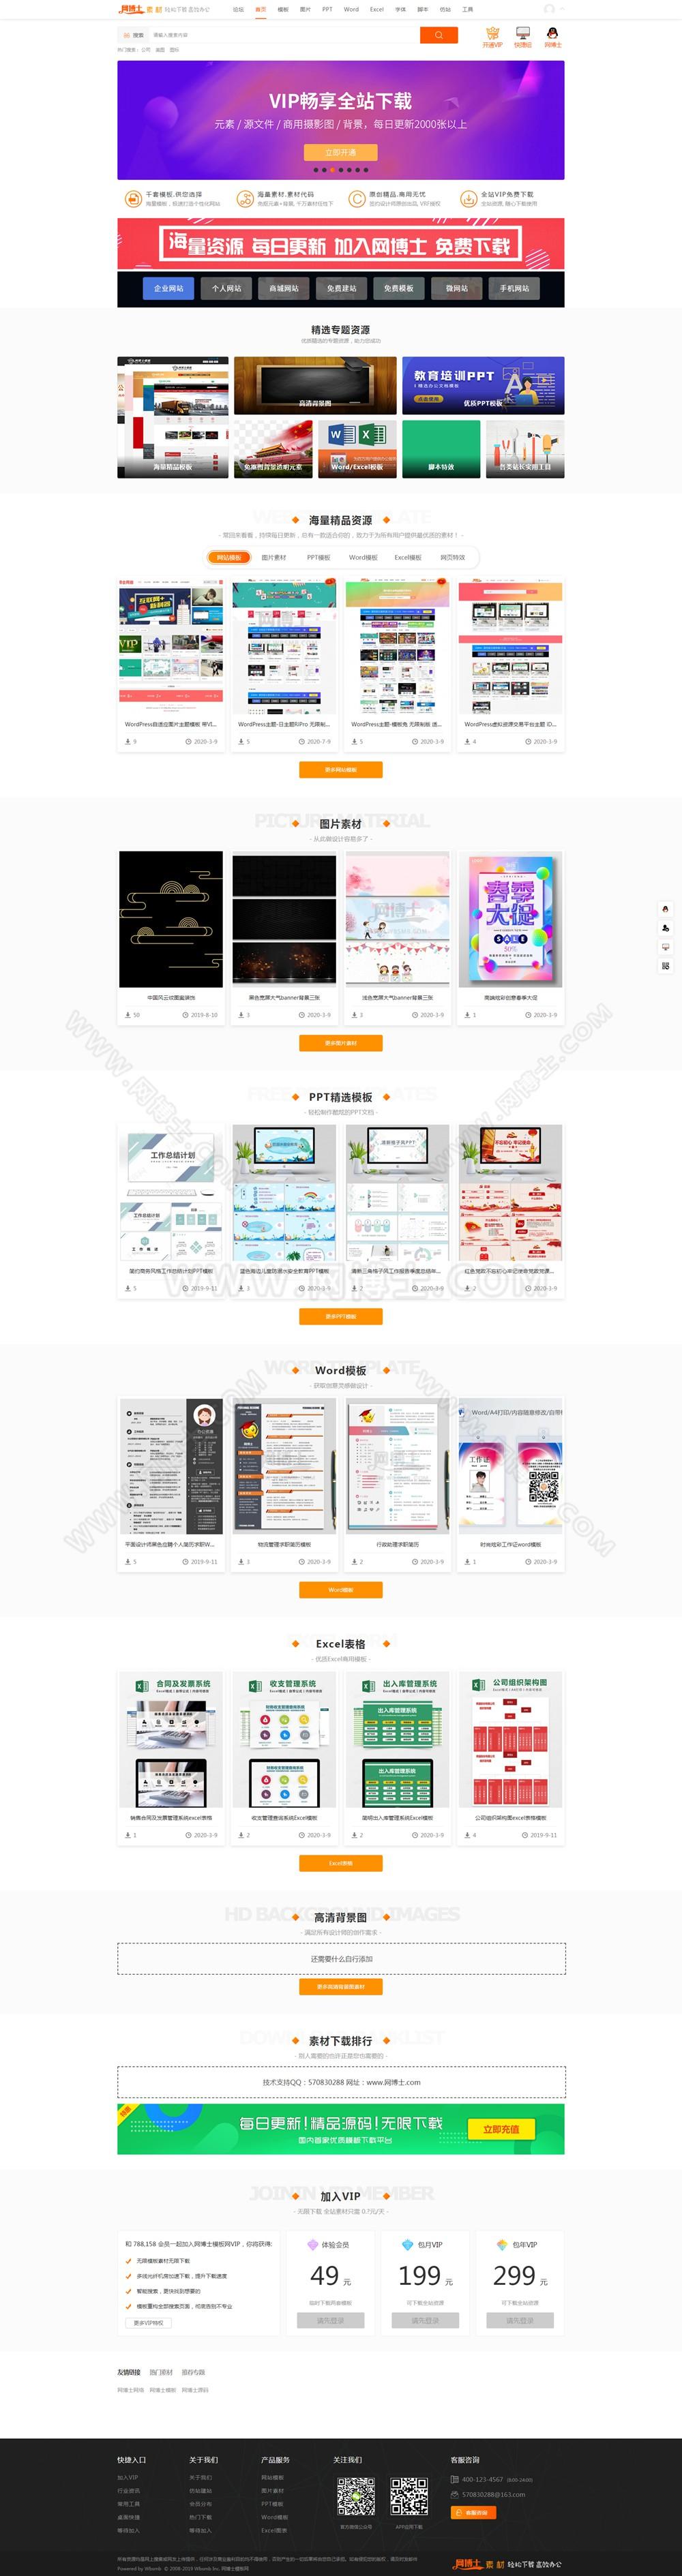 Discuz模板 虚拟资源 办公文档 网络资源下载 整站源码